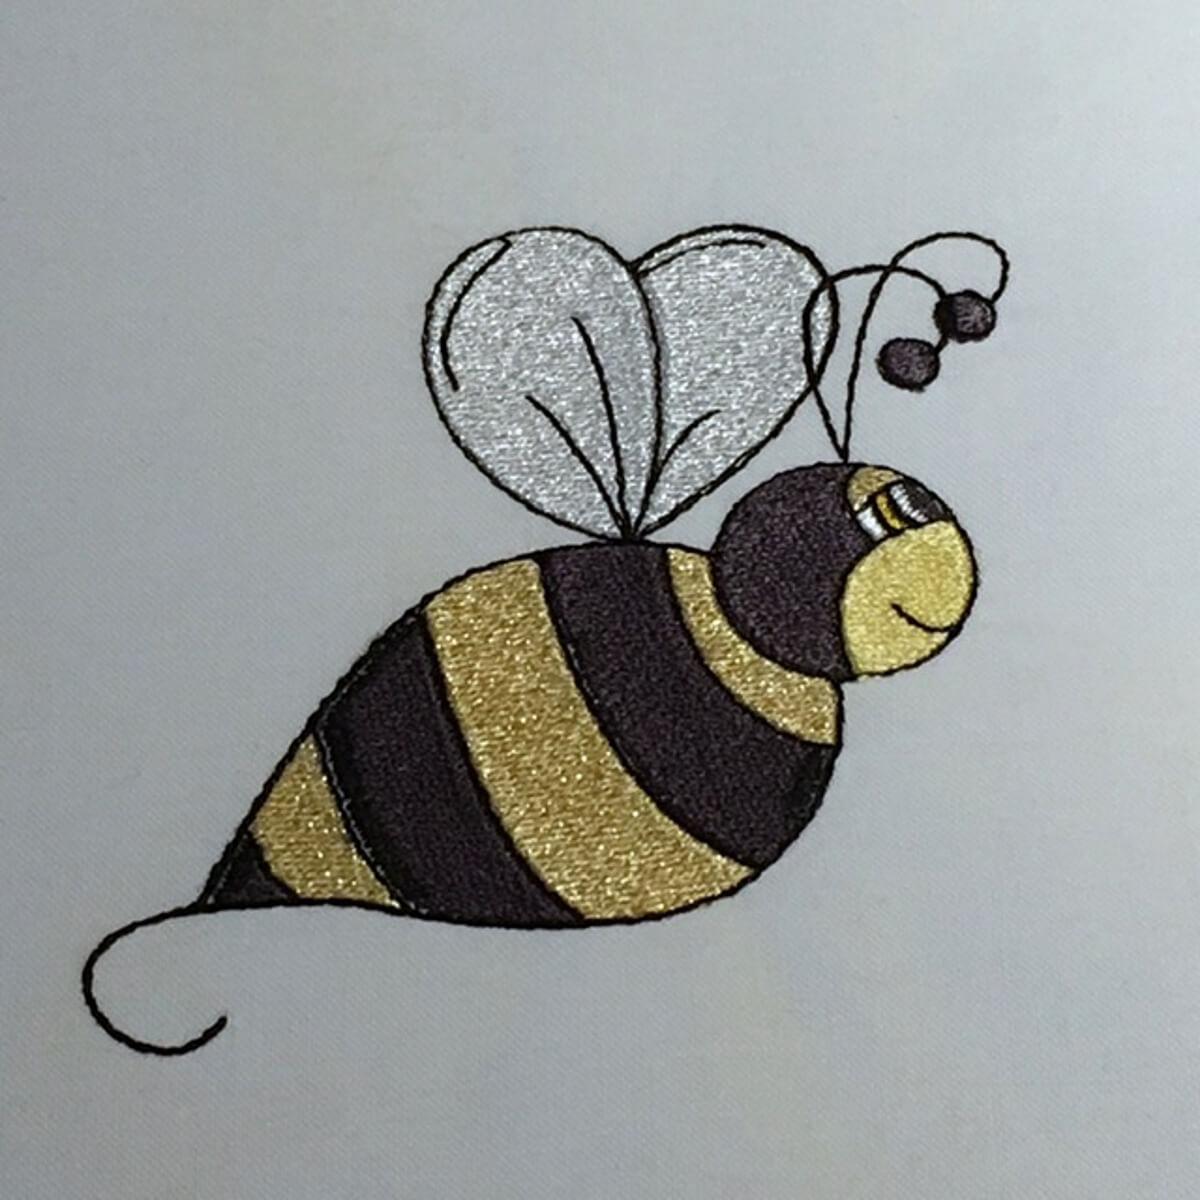 Stickdesign Bumble Bee - die Hummel (Download)